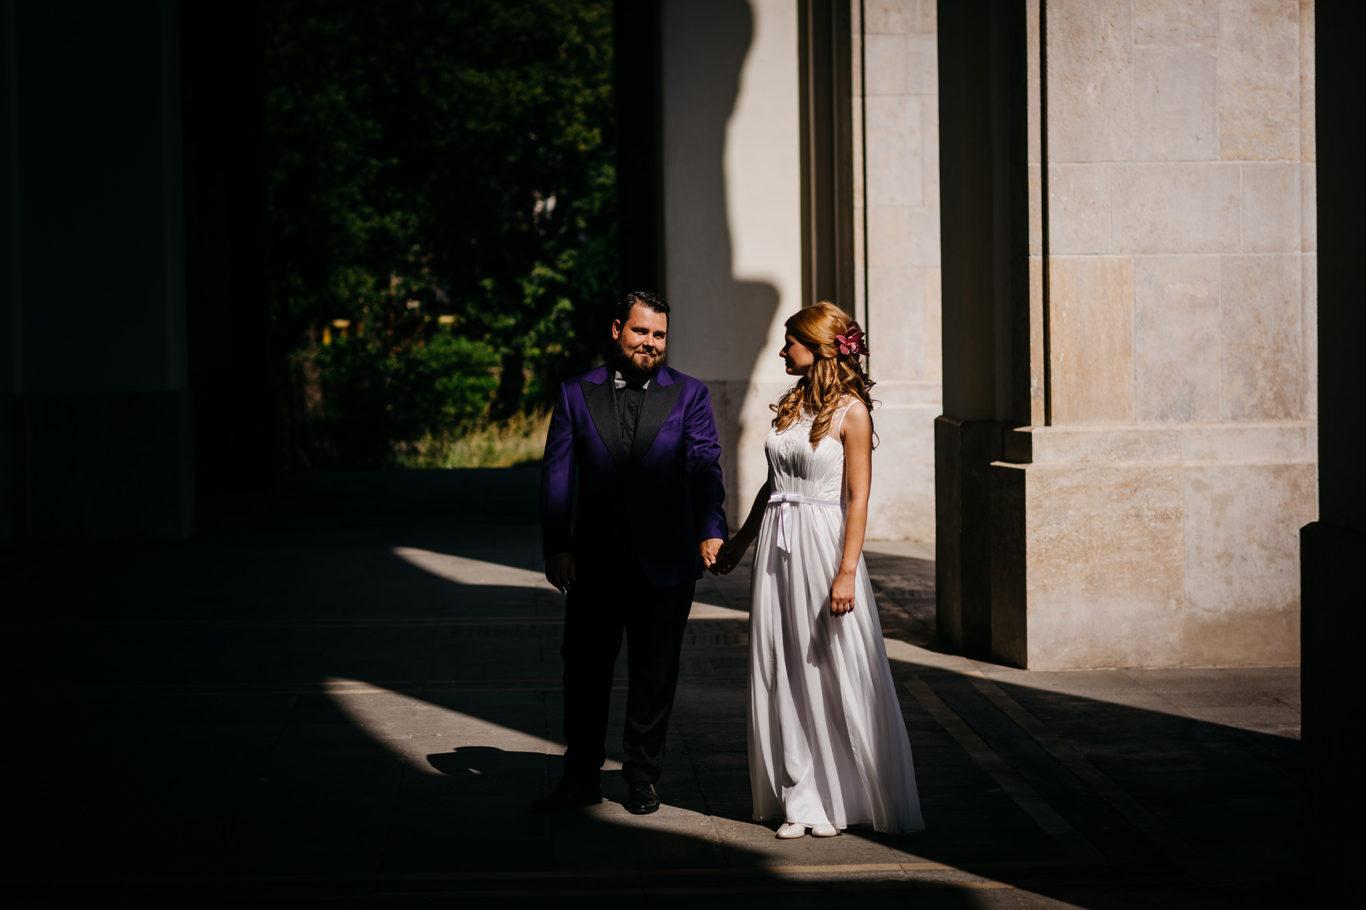 0160-fotografie-nunta-bucuresti-rodica-rares-fotograf-ciprian-dumitrescu-cd2_0025-3